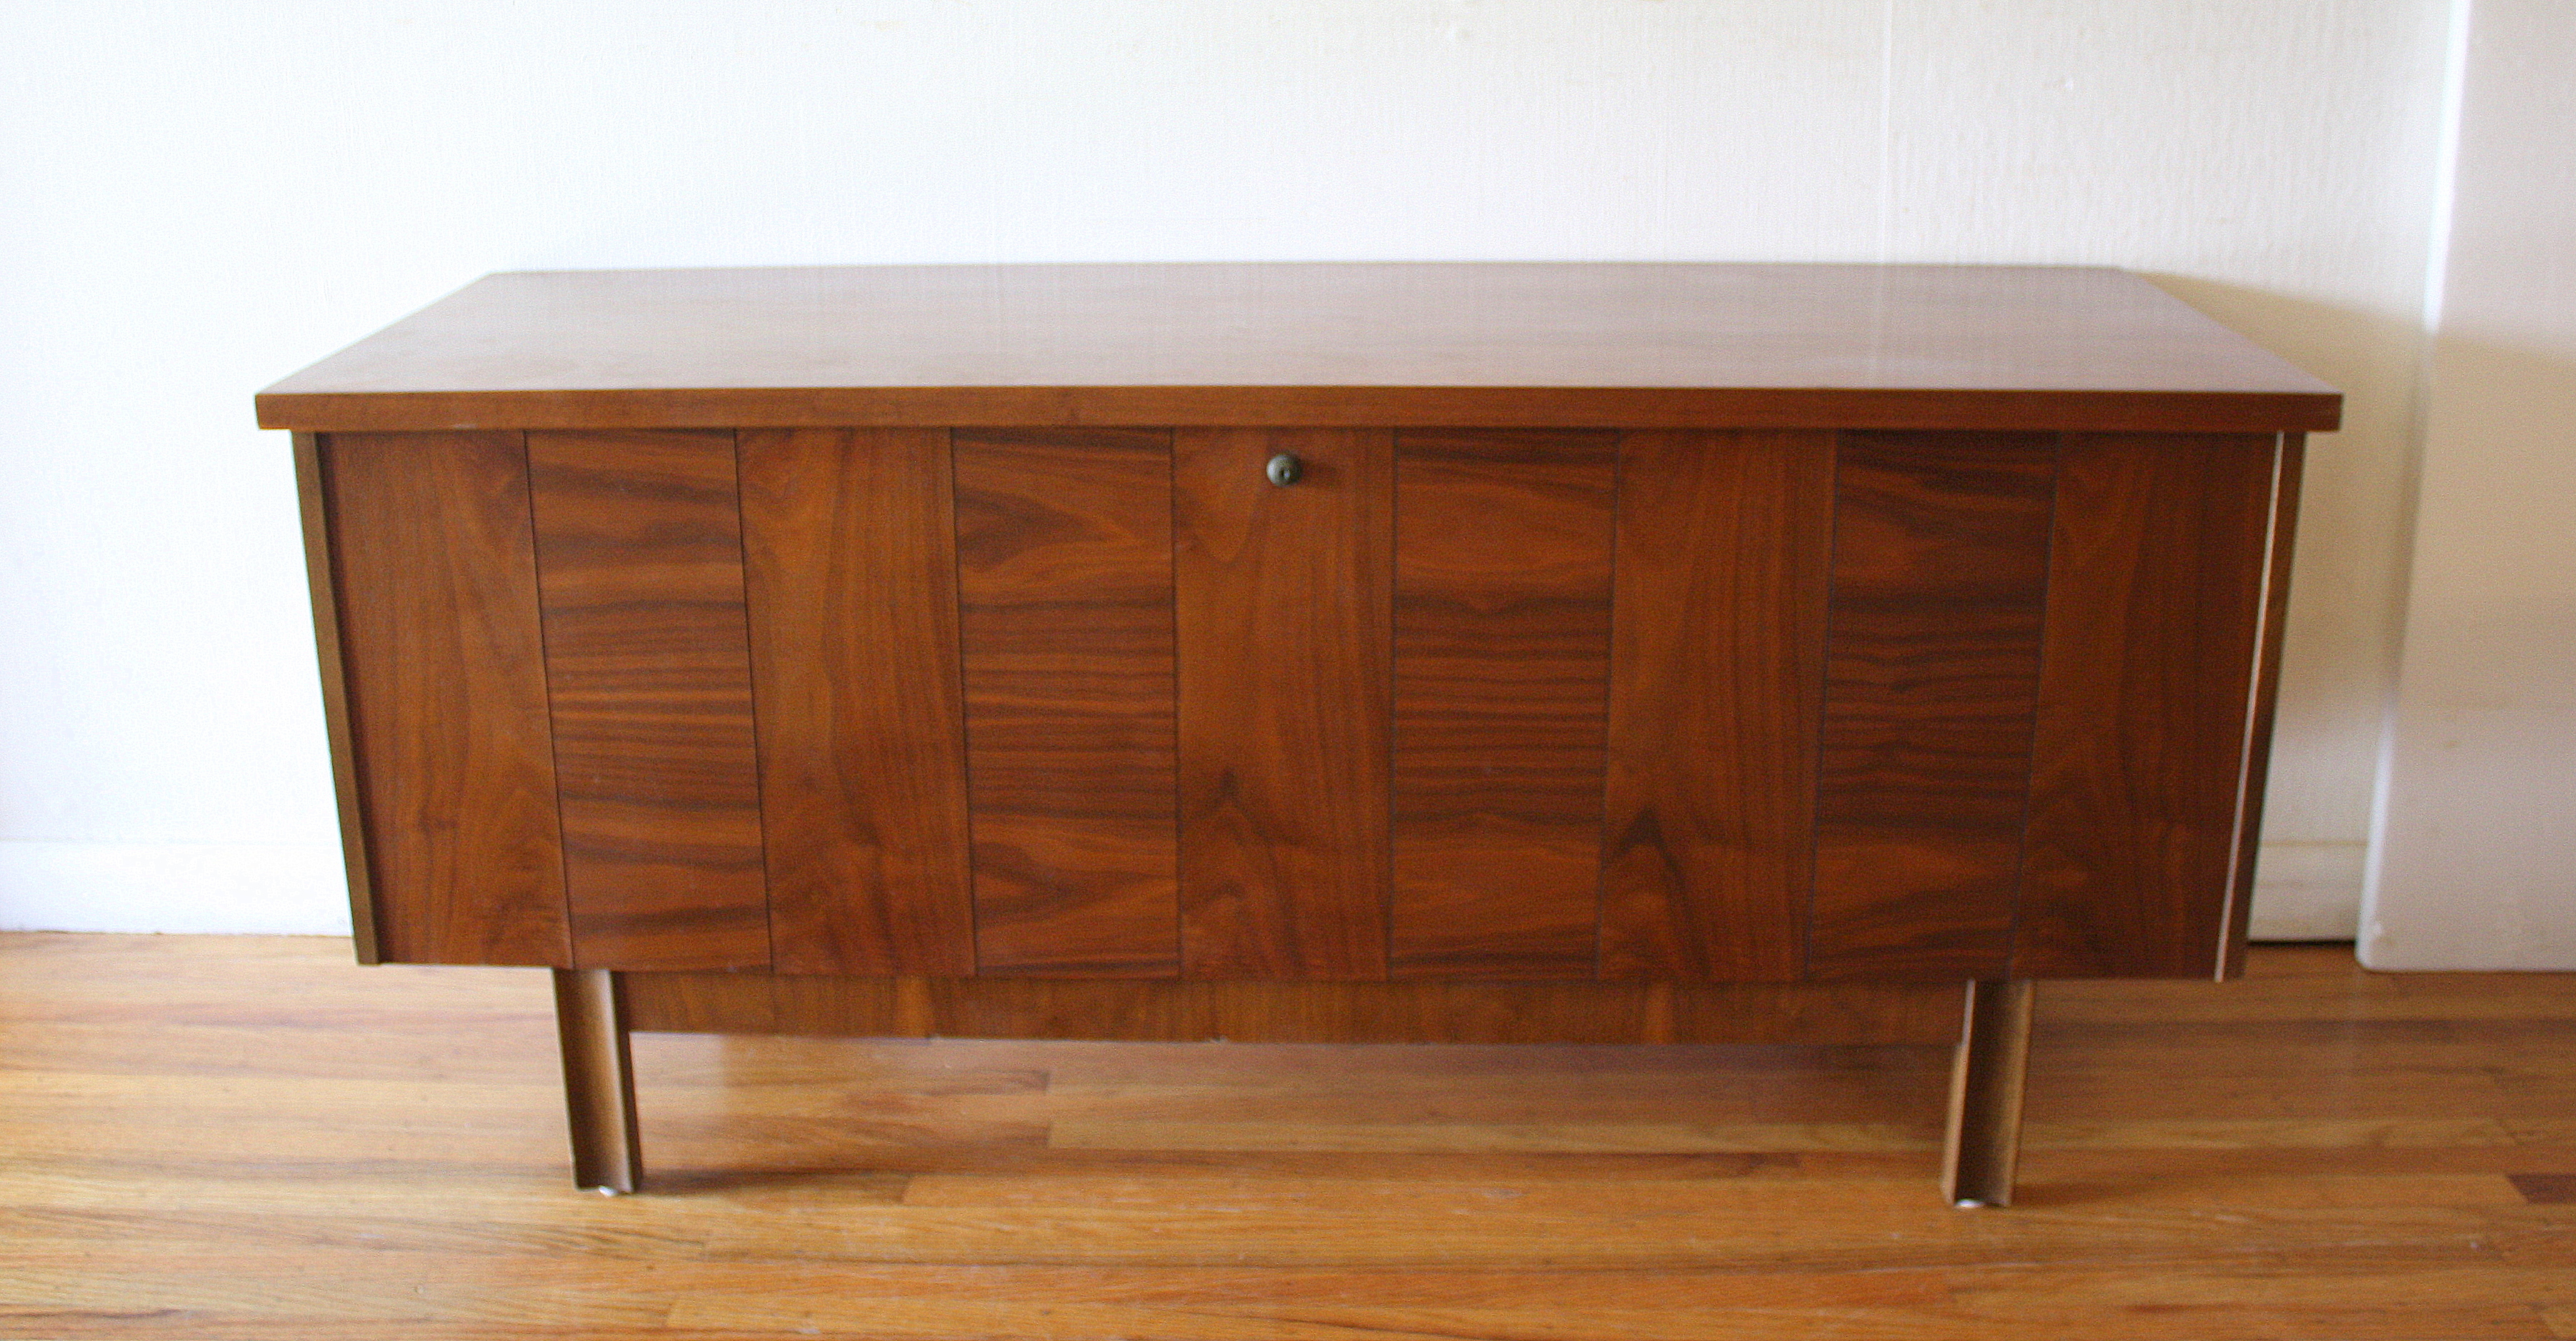 Lane juxtaposed wood cedar chest trunk 2